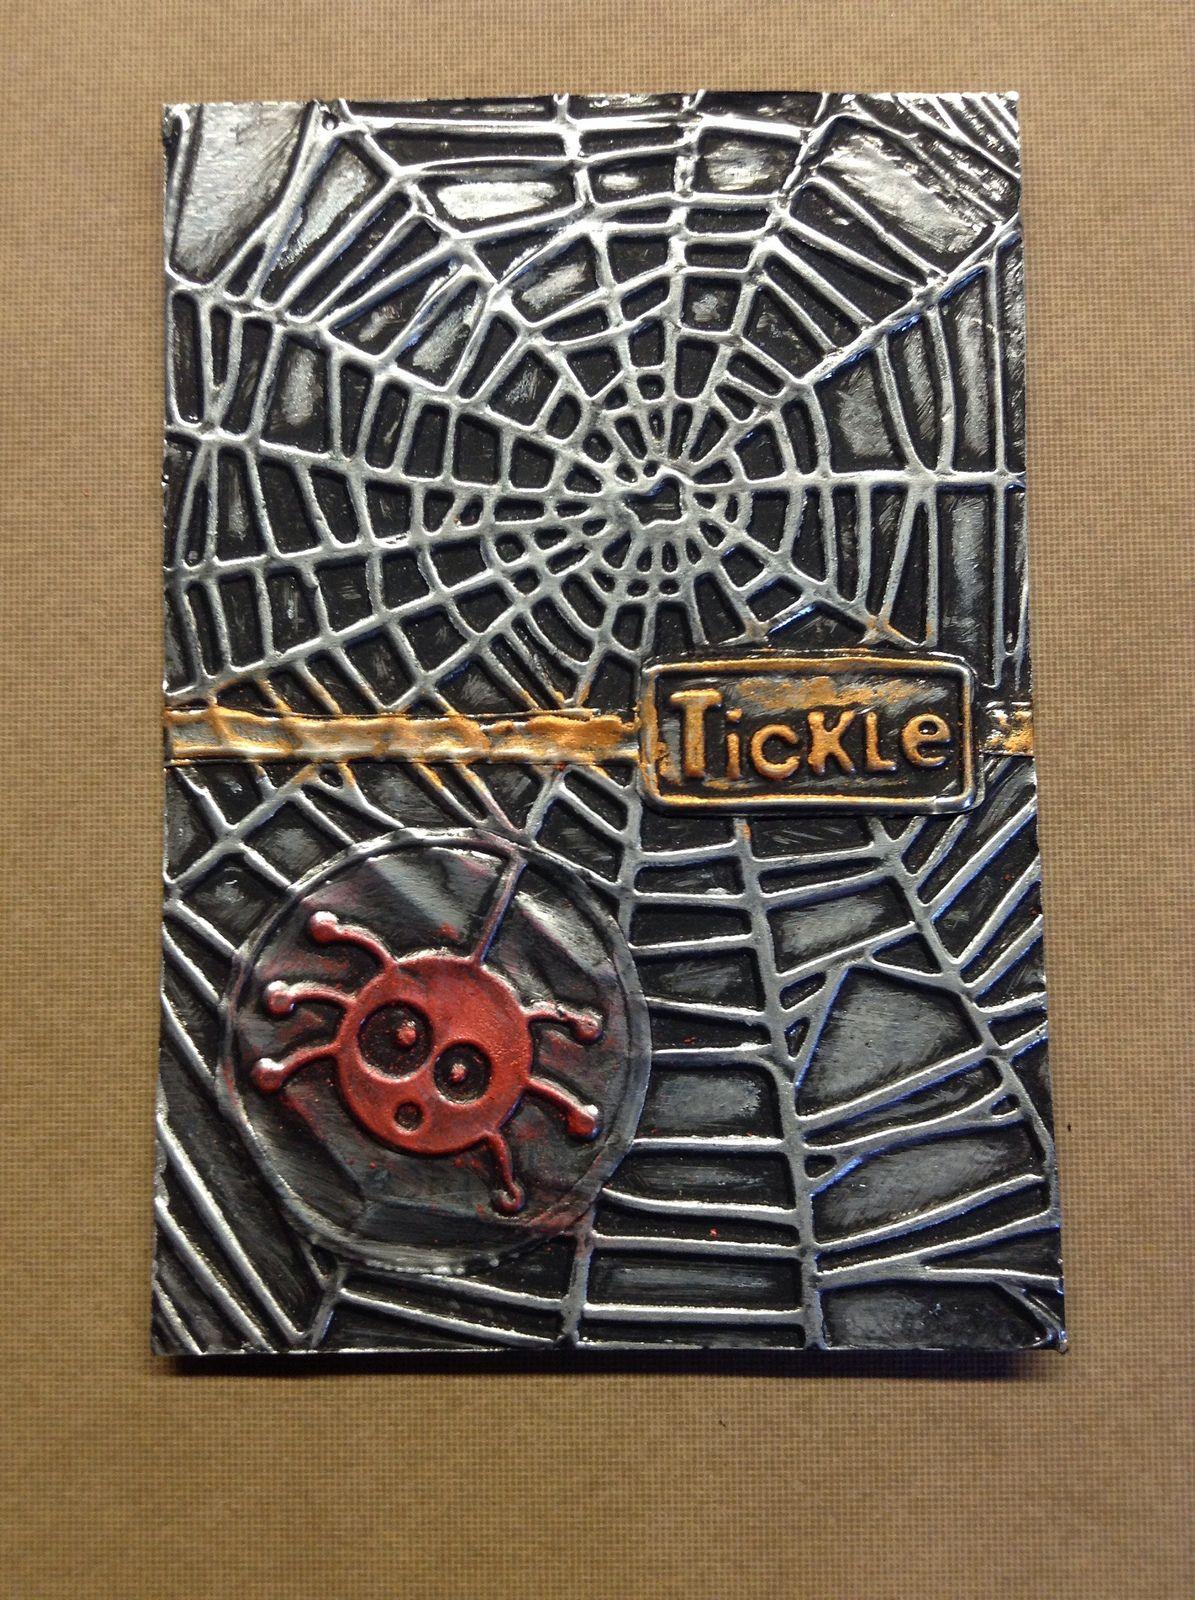 Metal Tape Art Window Google Search Metal Tape Art Tape Art Metal Tape